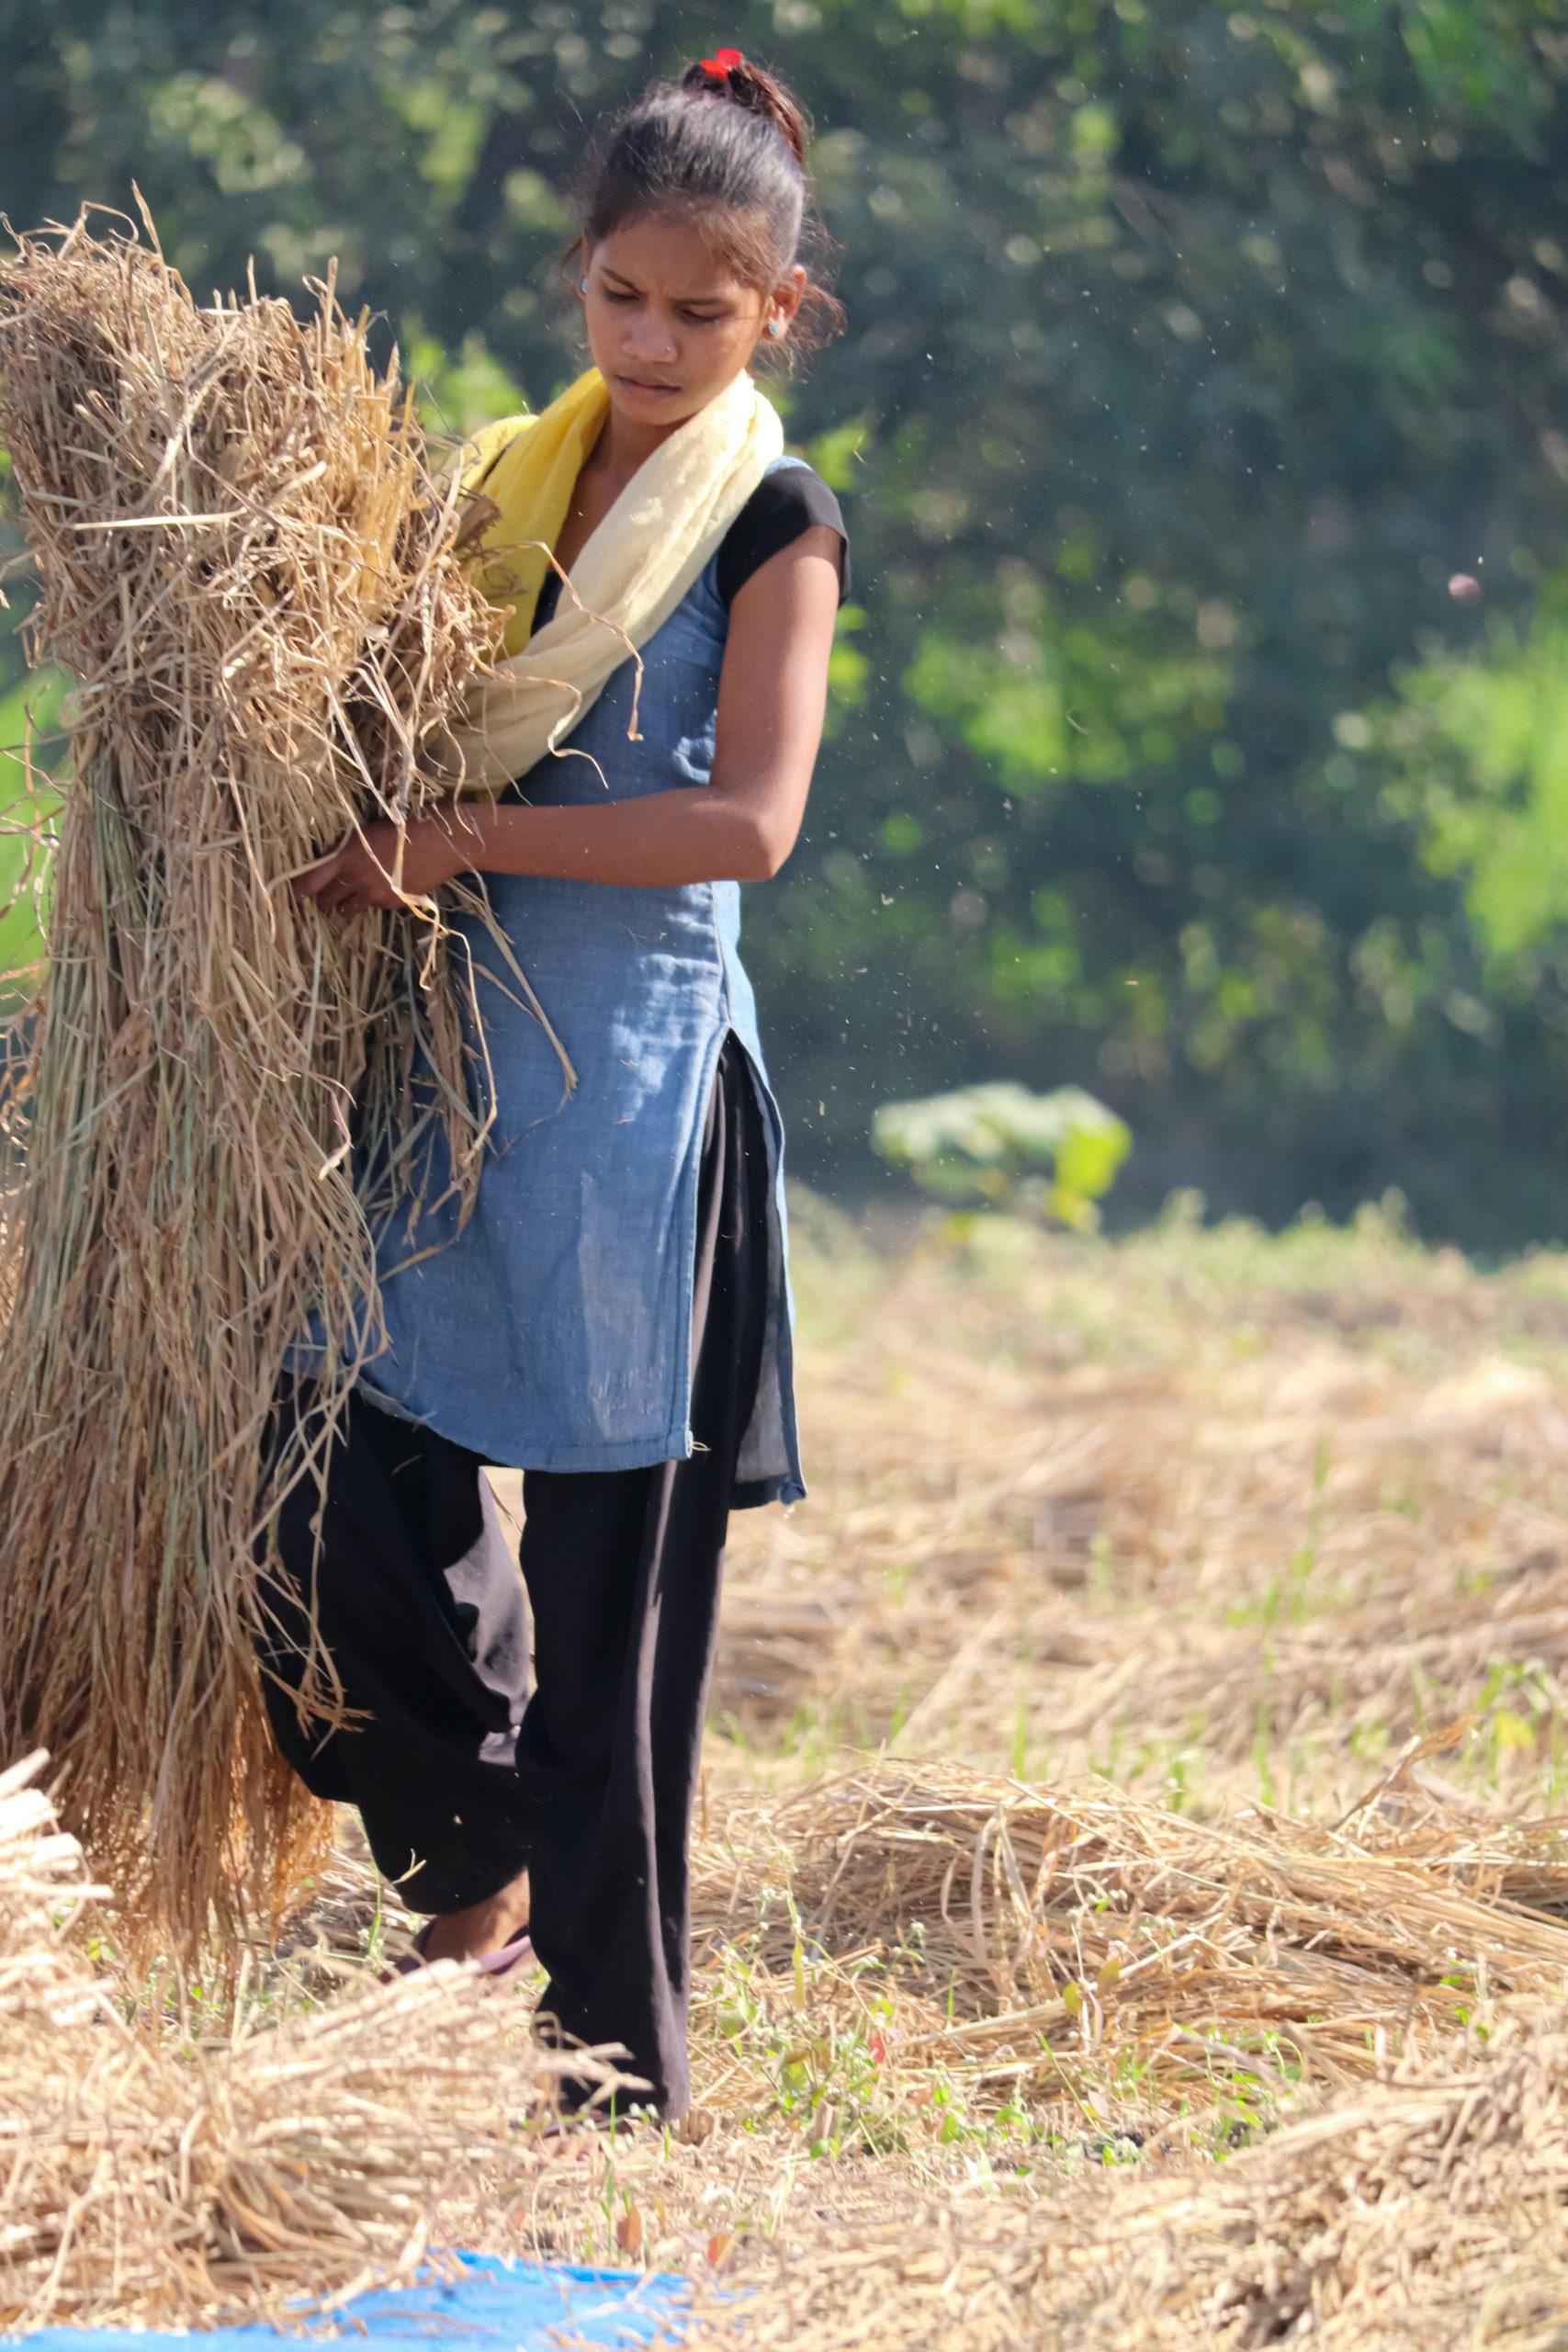 Girl moving hay